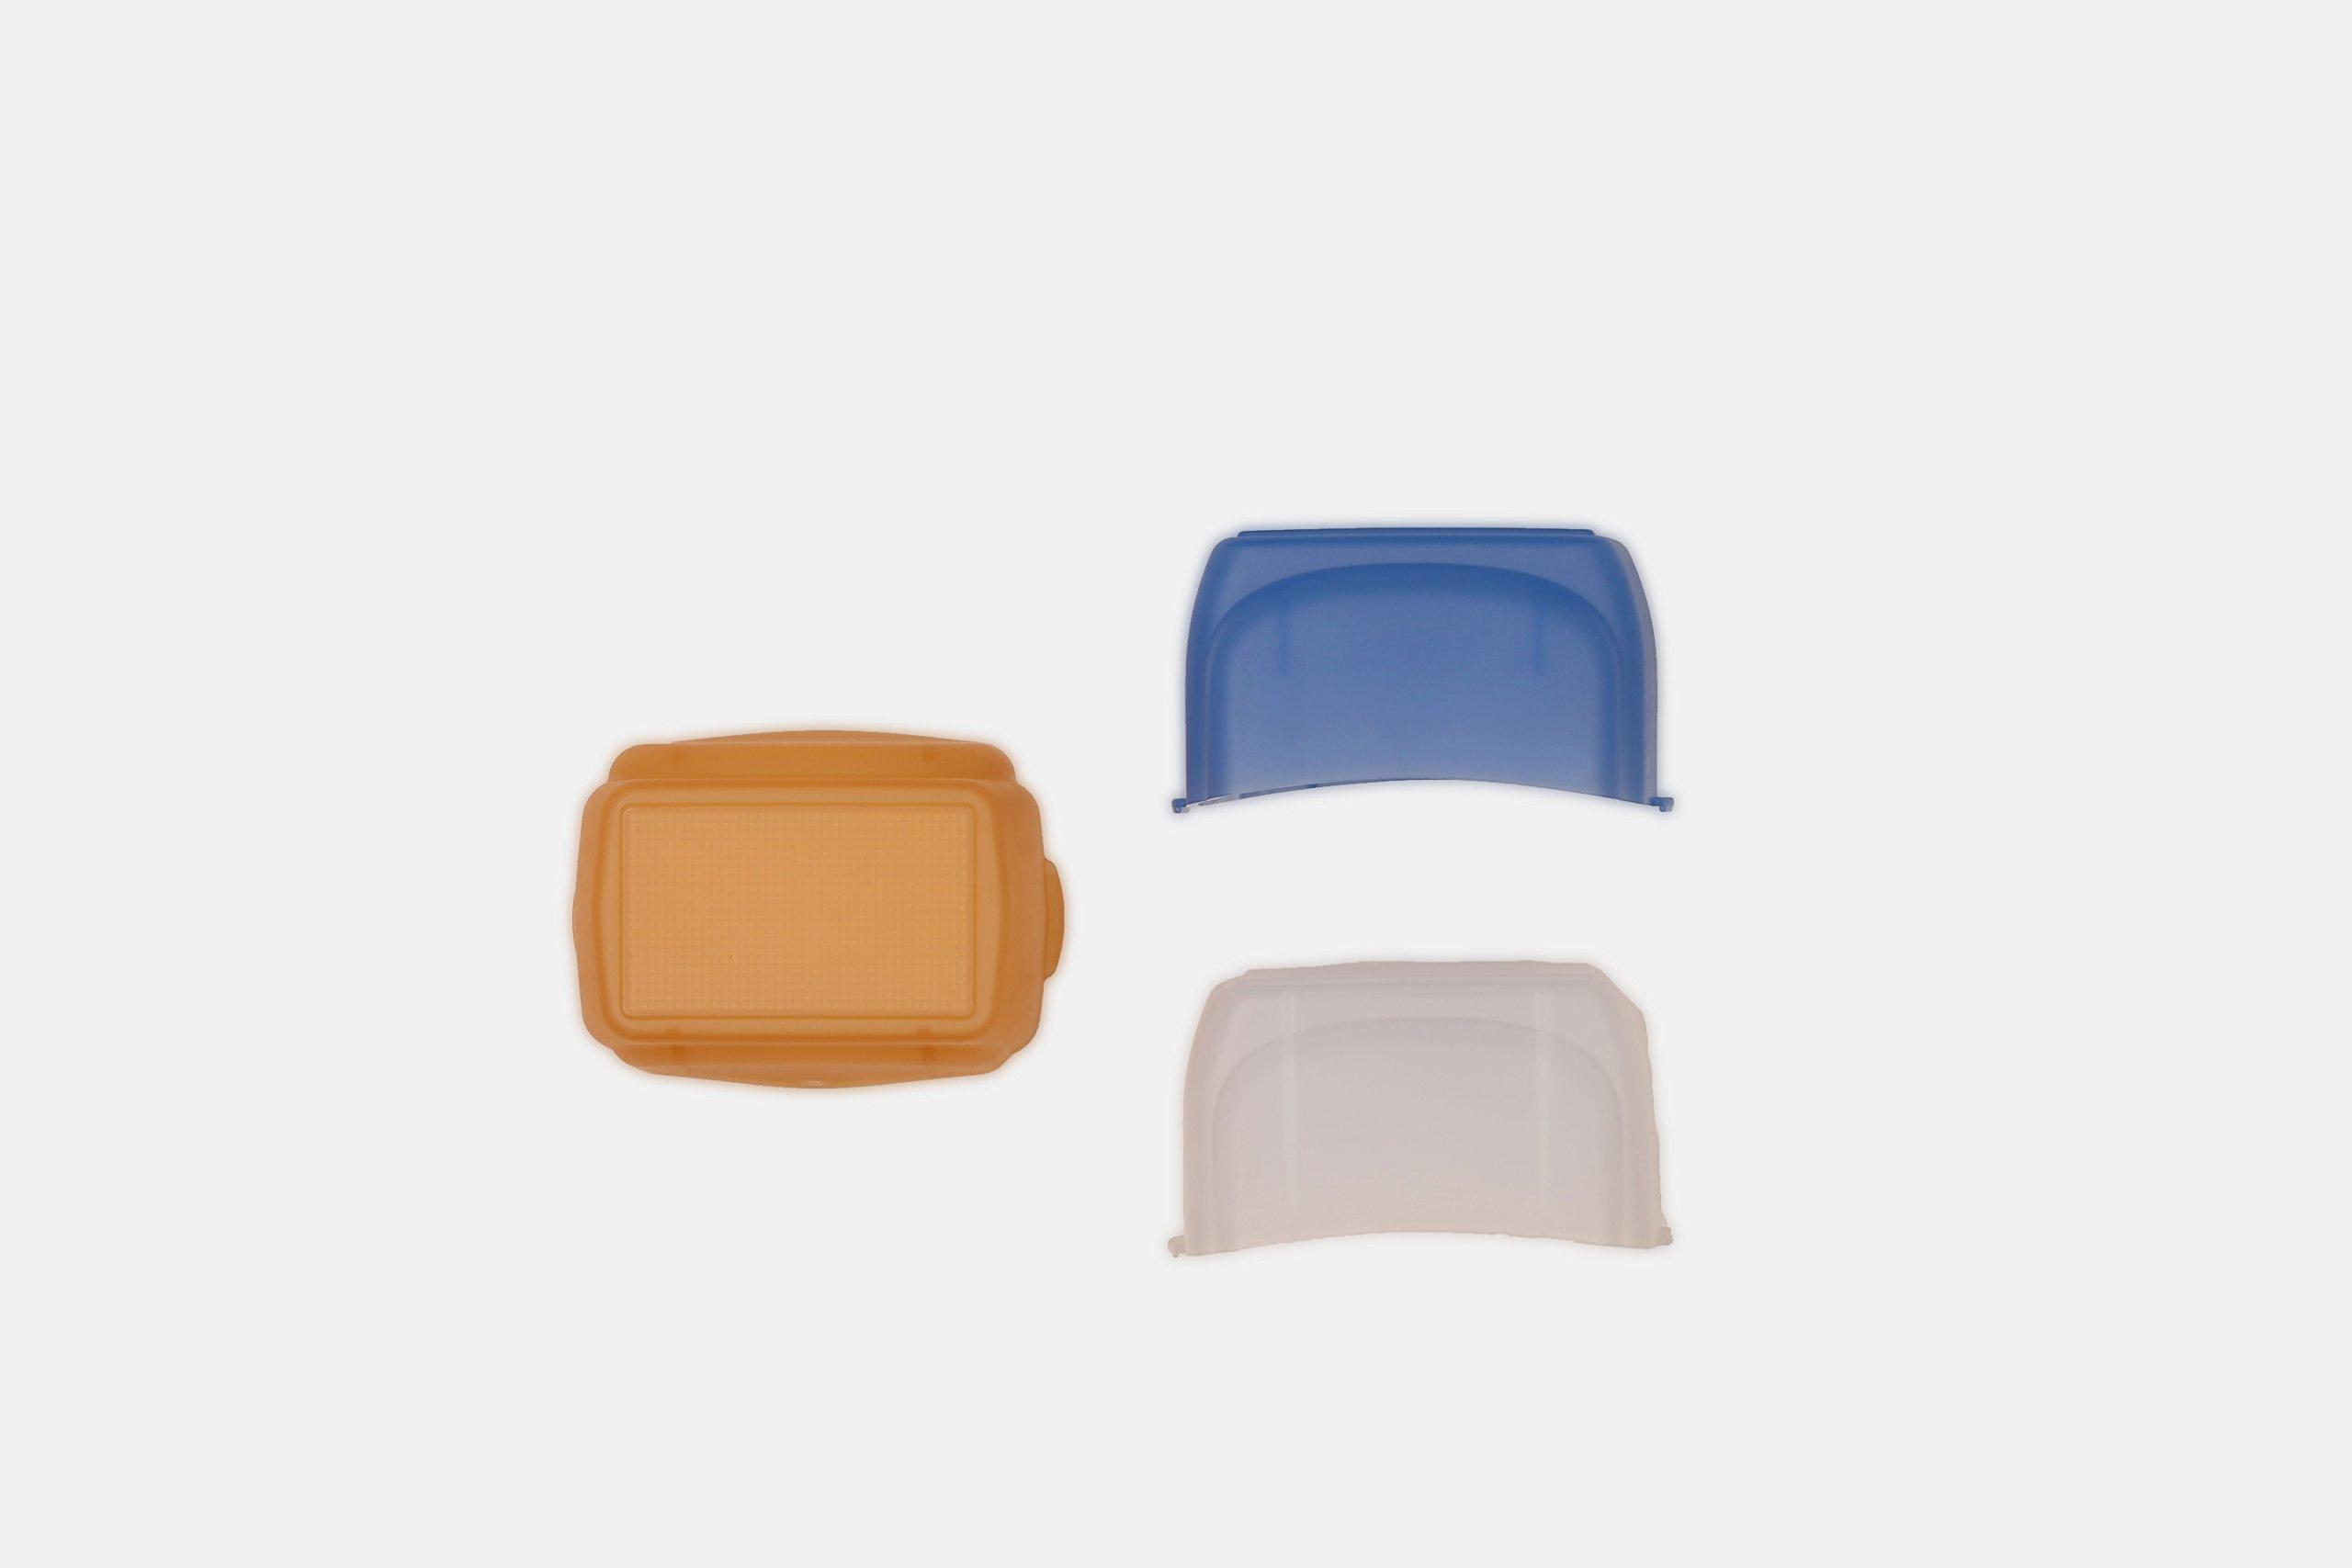 Cactus Color Diffusion Cap Kit DC-60 Color Diffusers, White/Blue/Orange